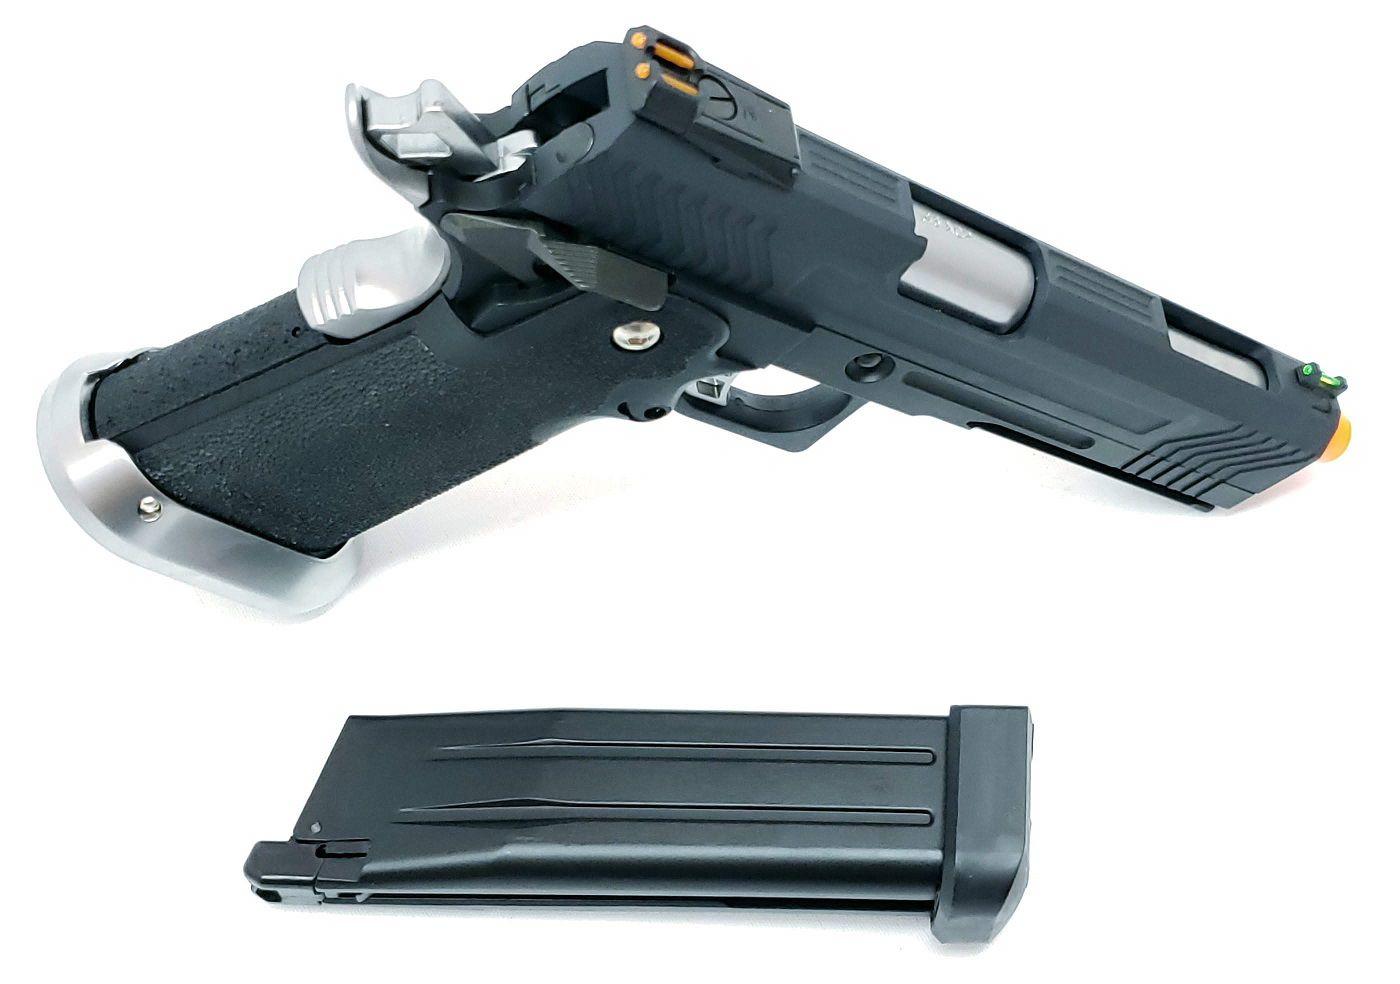 Pistola Airsoft Armorer Works Hicapa HX1102